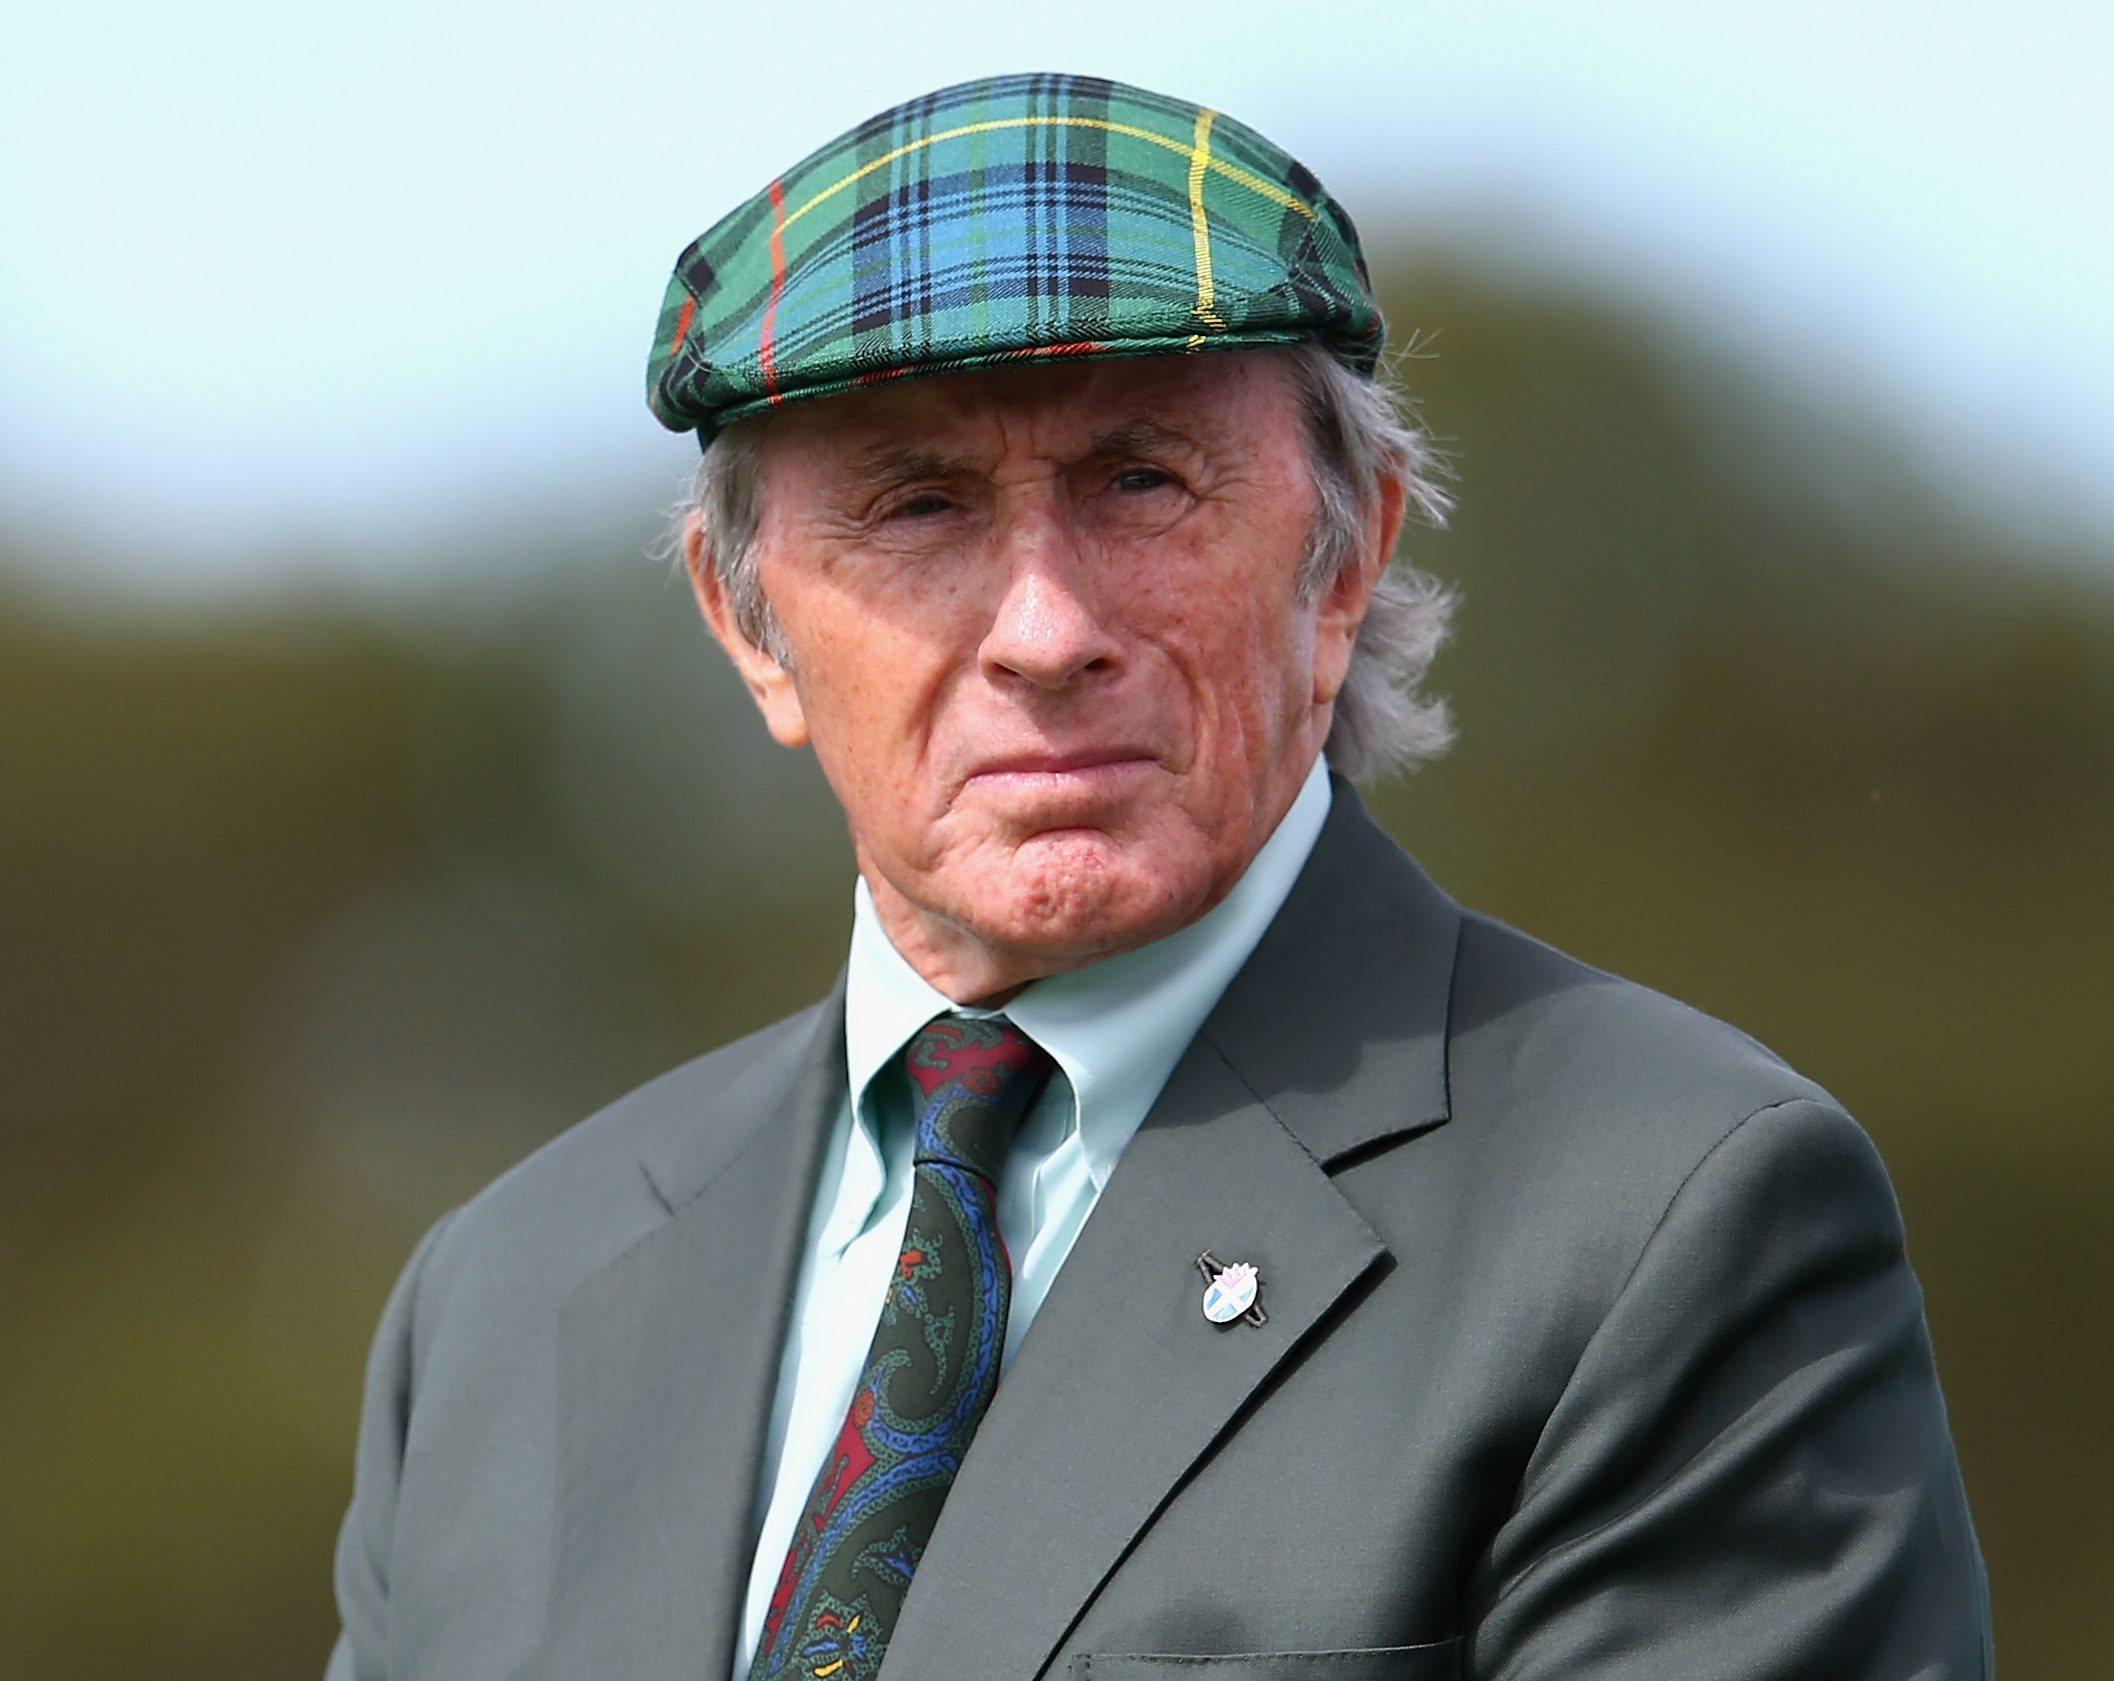 F1 hero Jackie Stewart's charity gives £1.5m to dementia battle